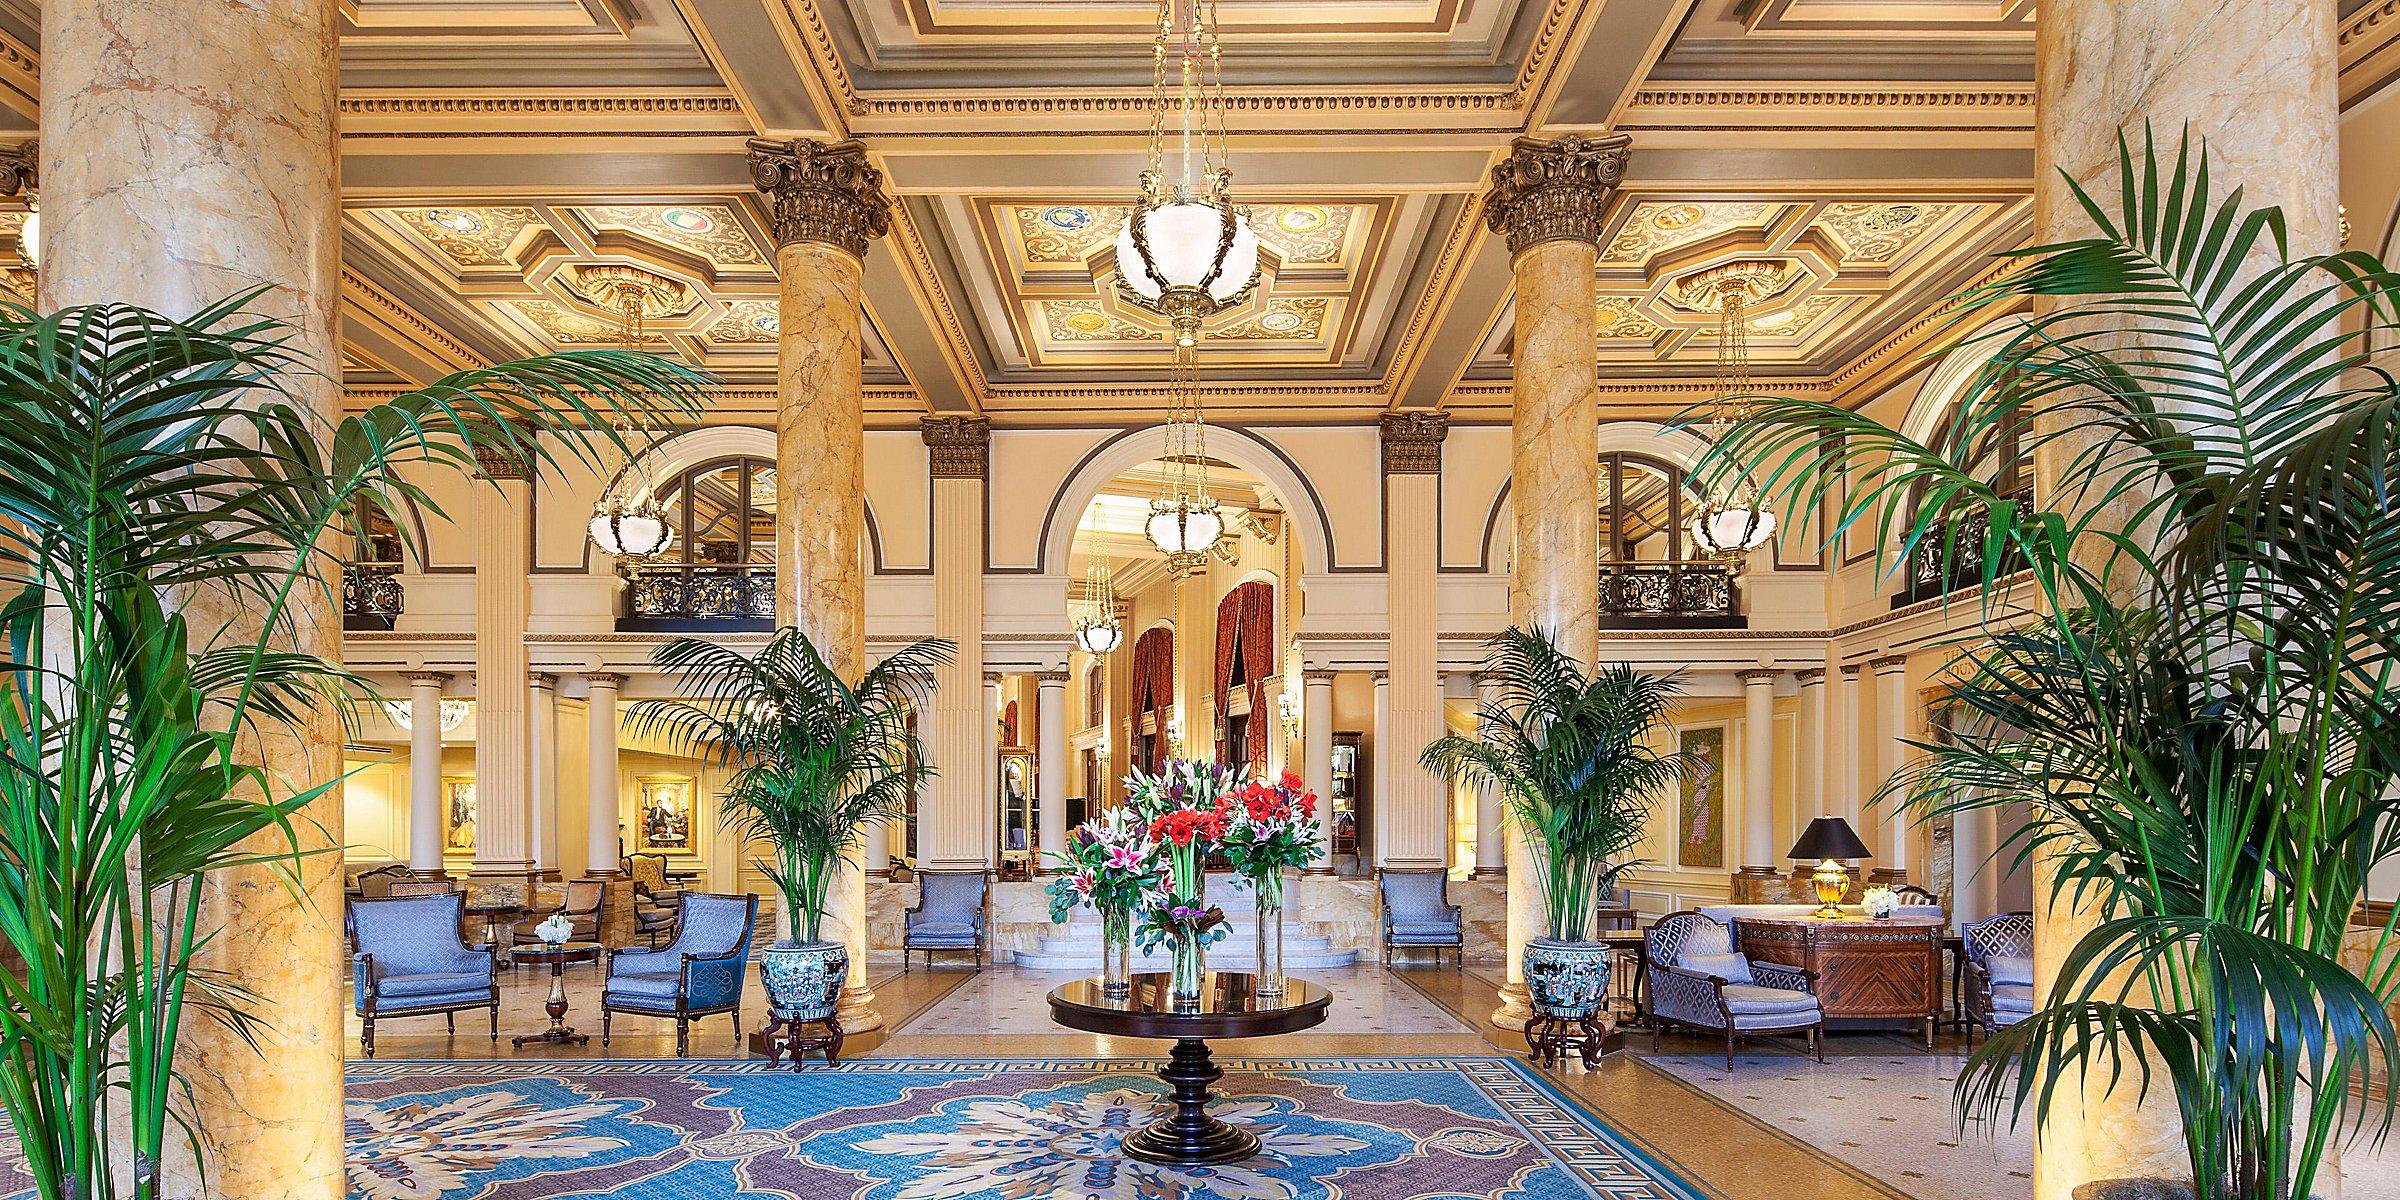 Washington Dc Hotels >> Intercontinental The Willard Washington Dc Luxury Dc